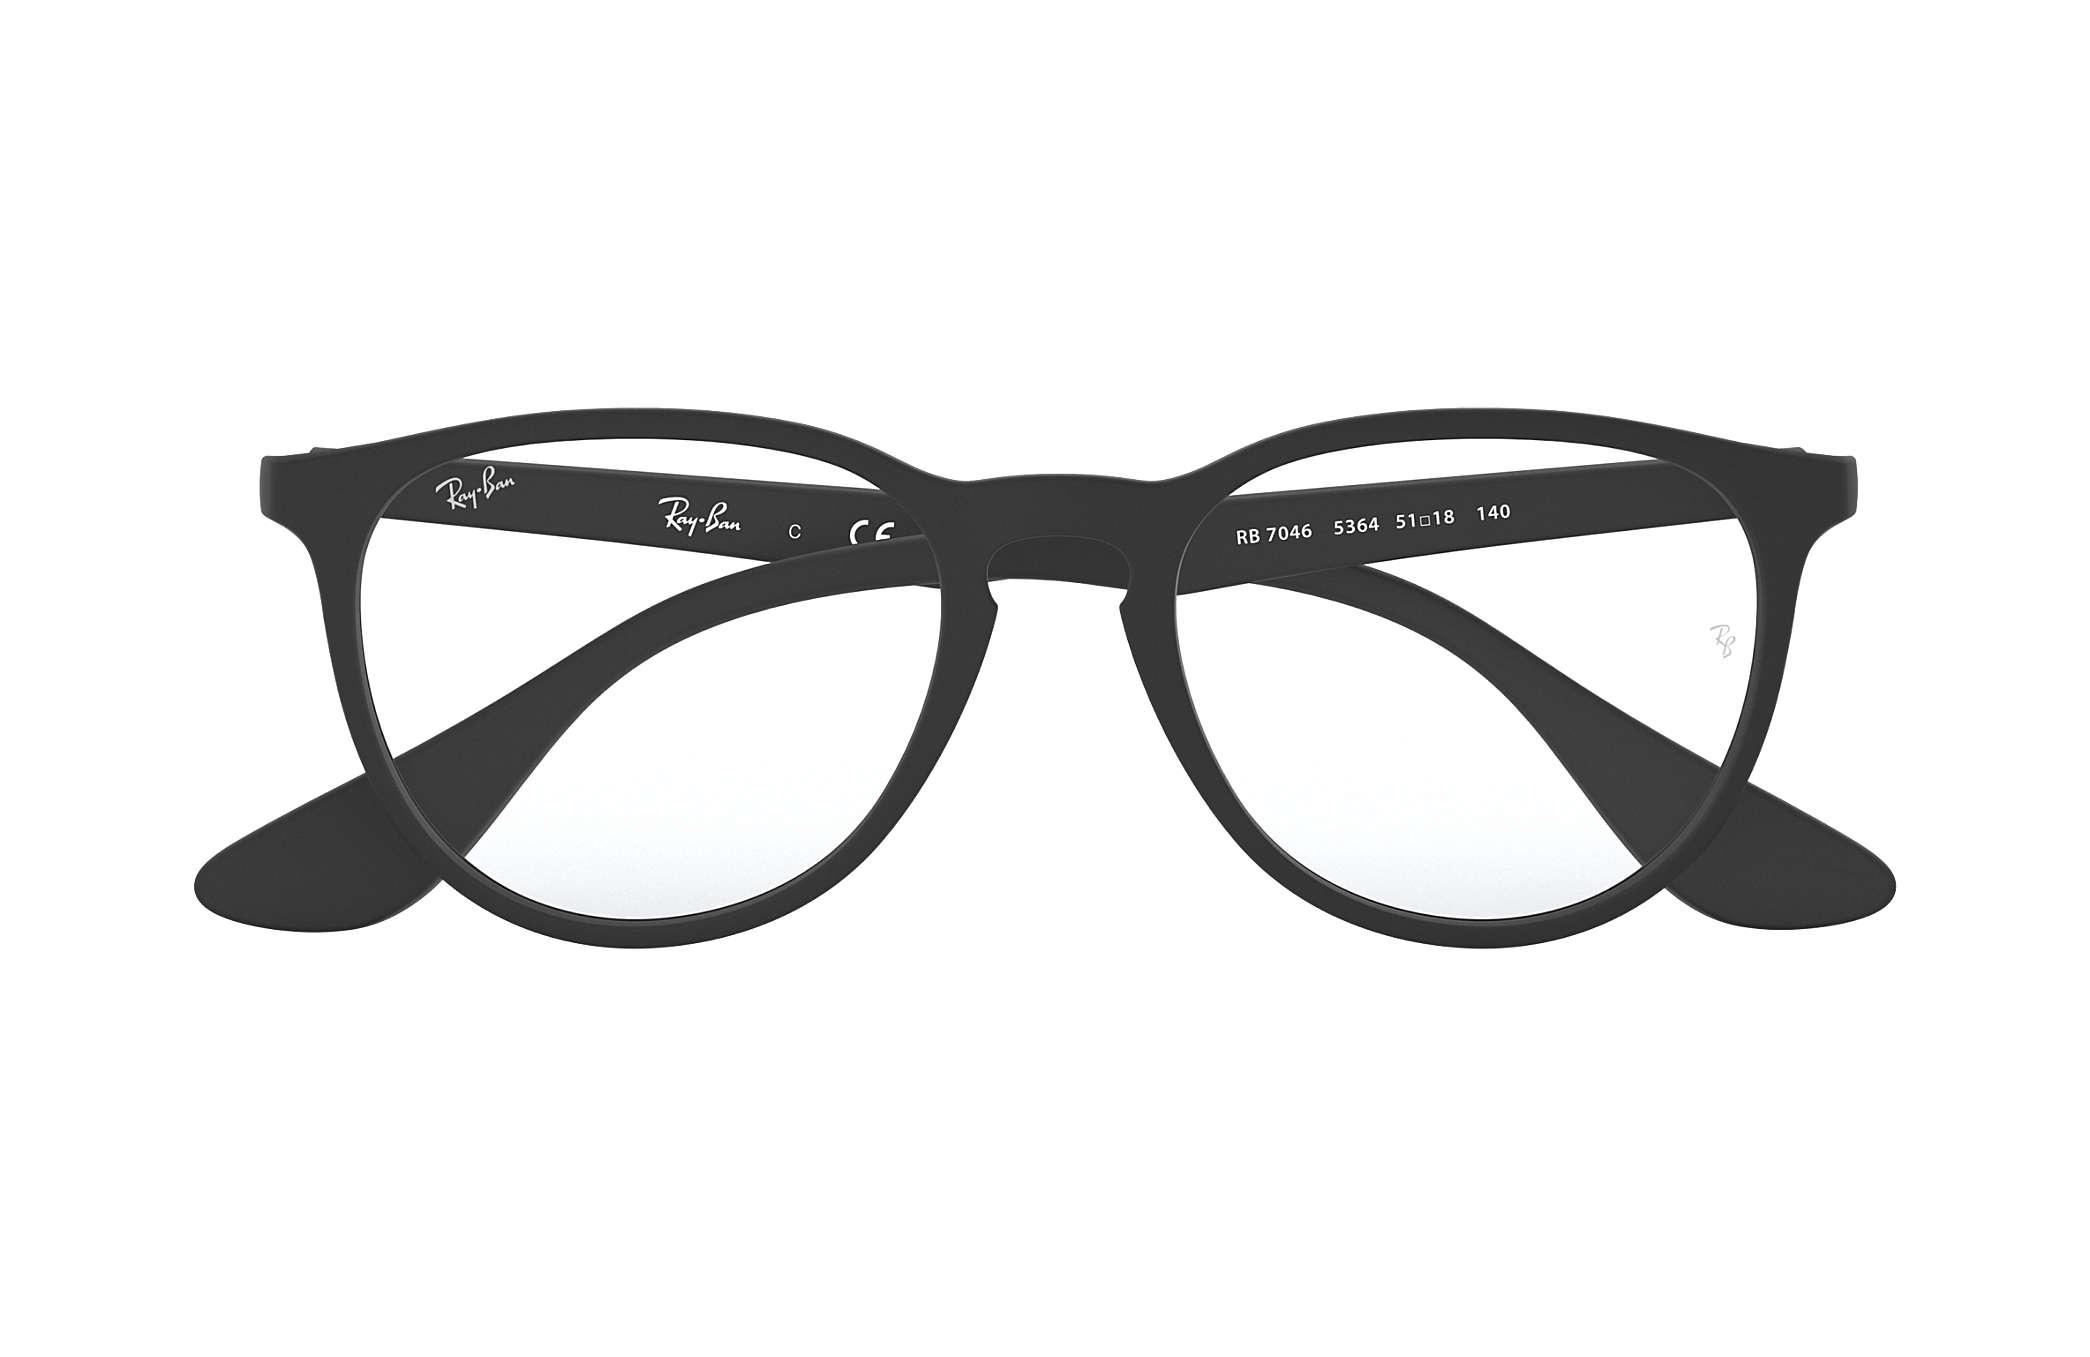 9b7b0c8e69 Ray-Ban eyeglasses Erika Optics RB7046 Black - Nylon - 0RX7046536451 ...